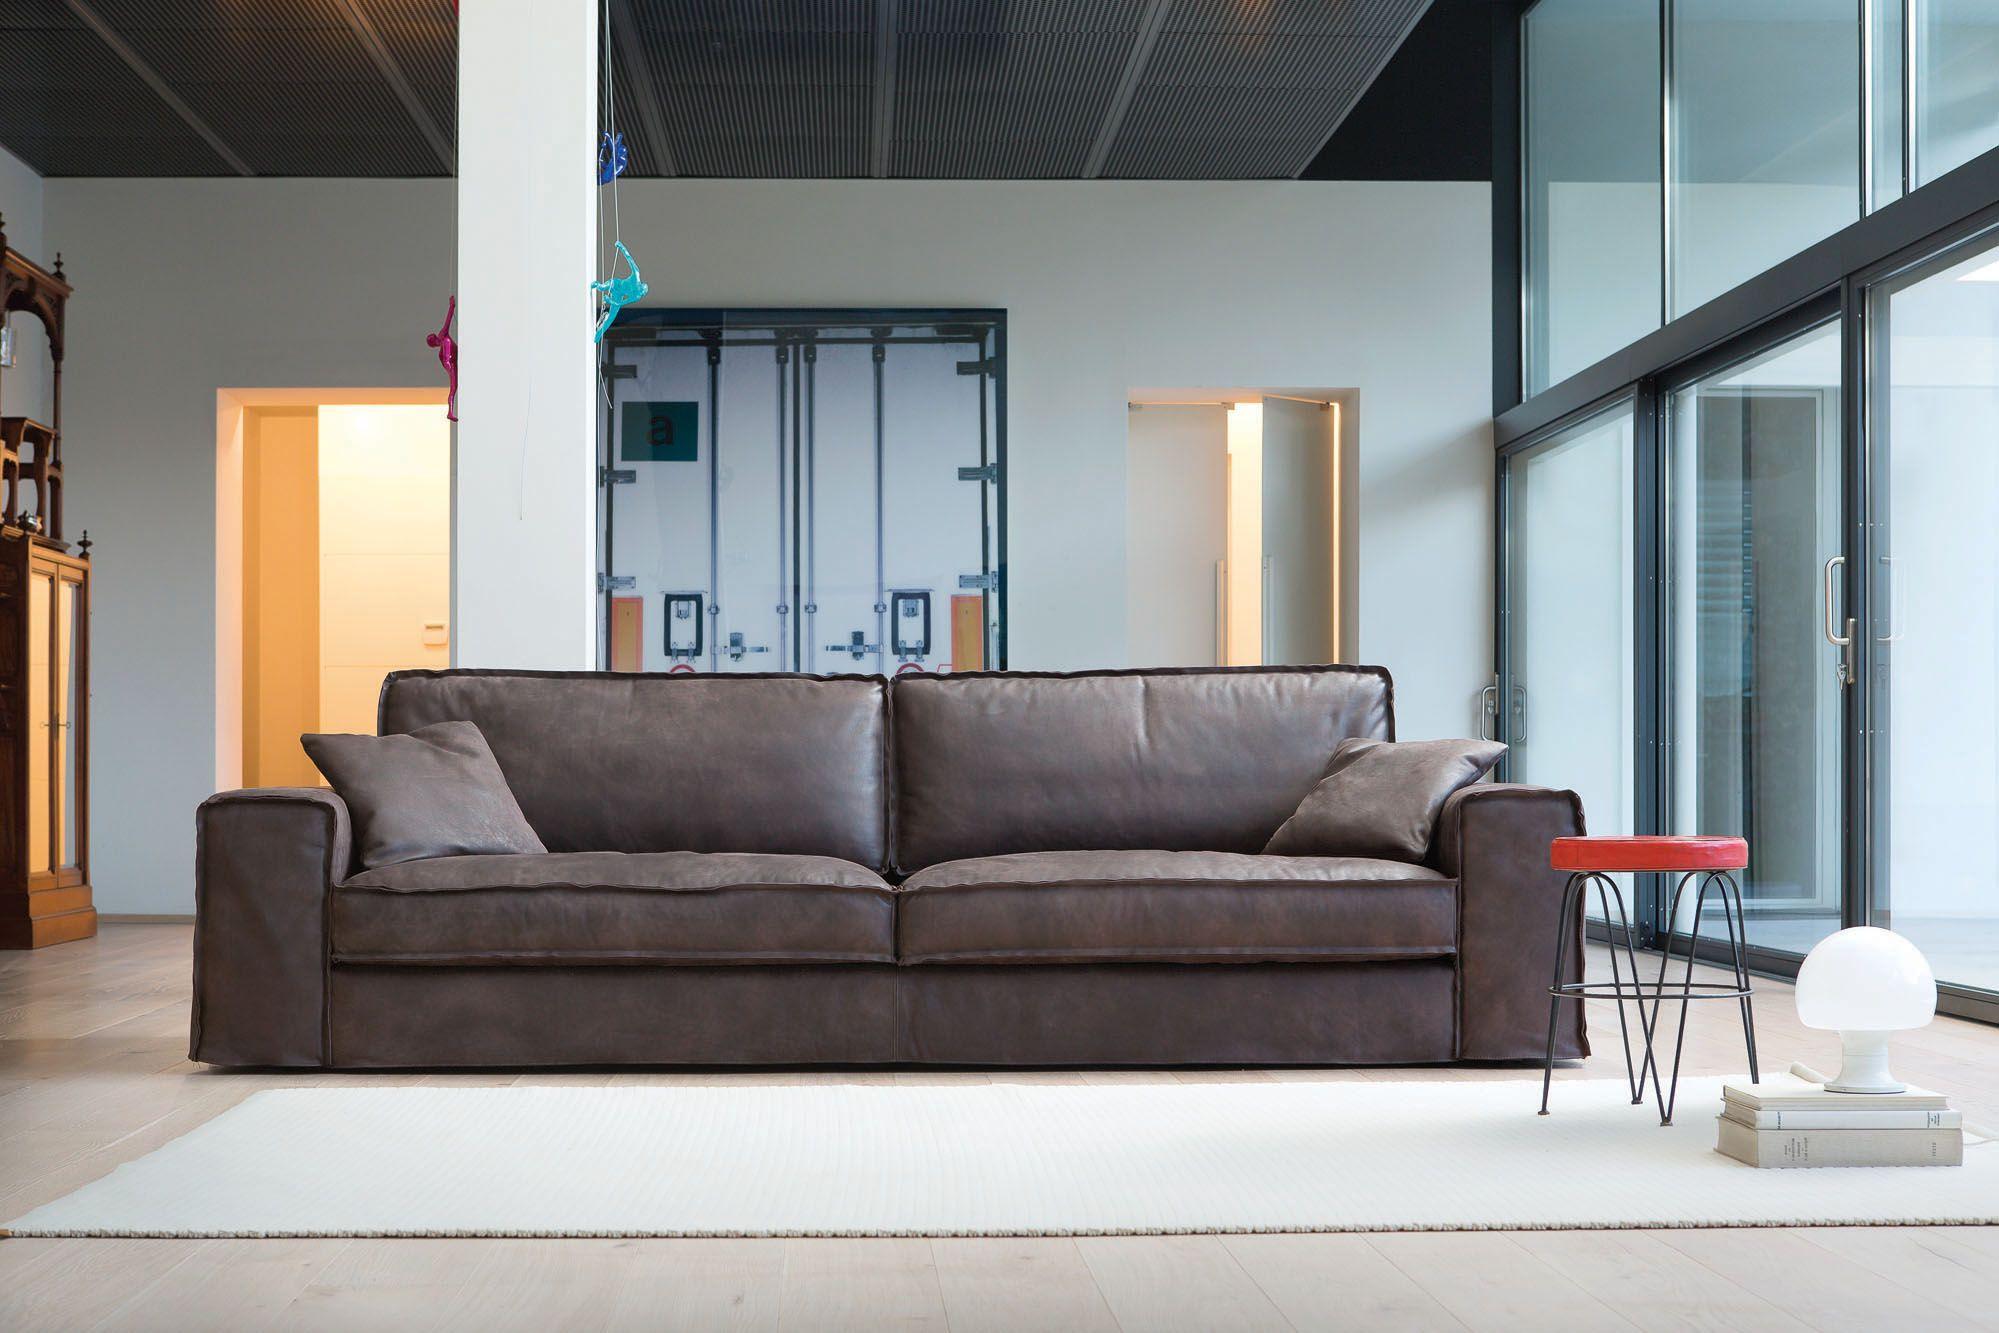 SANTORINI SOFA Fabric and leather covers Model Santorini